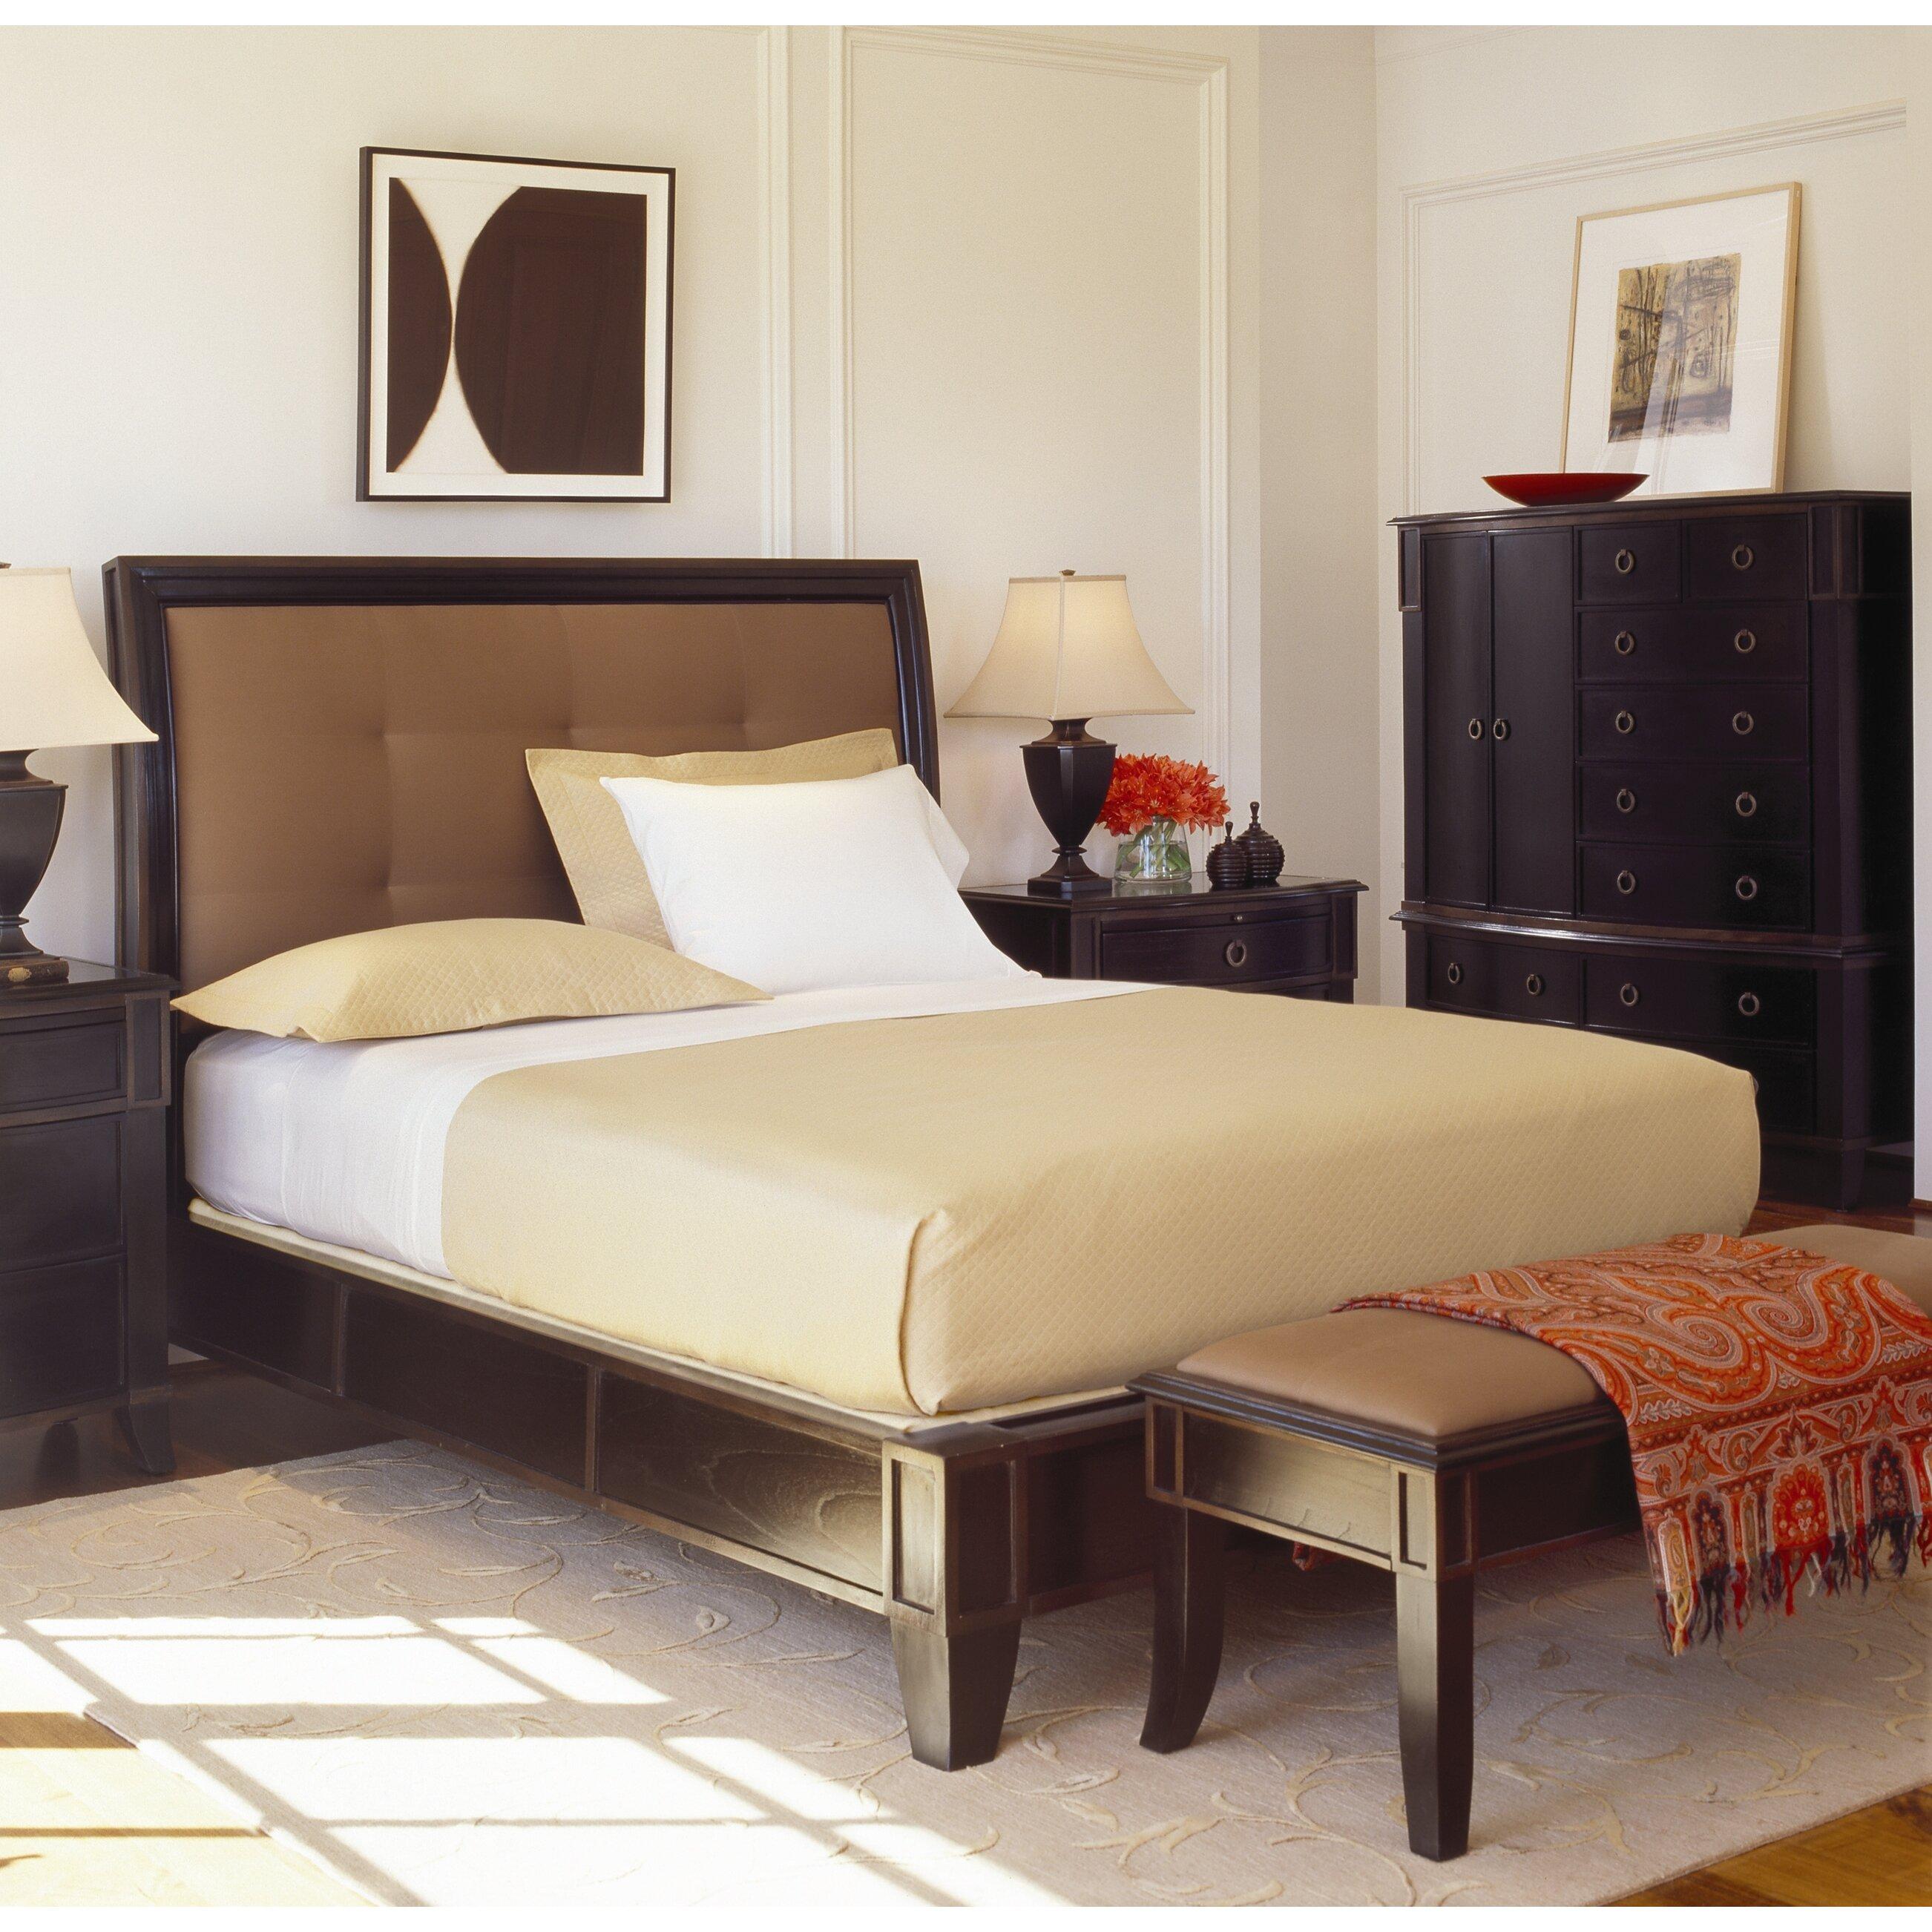 Brownstonefurniture Metropolitan Platform Customizable Bedroom Set Reviews Wayfair